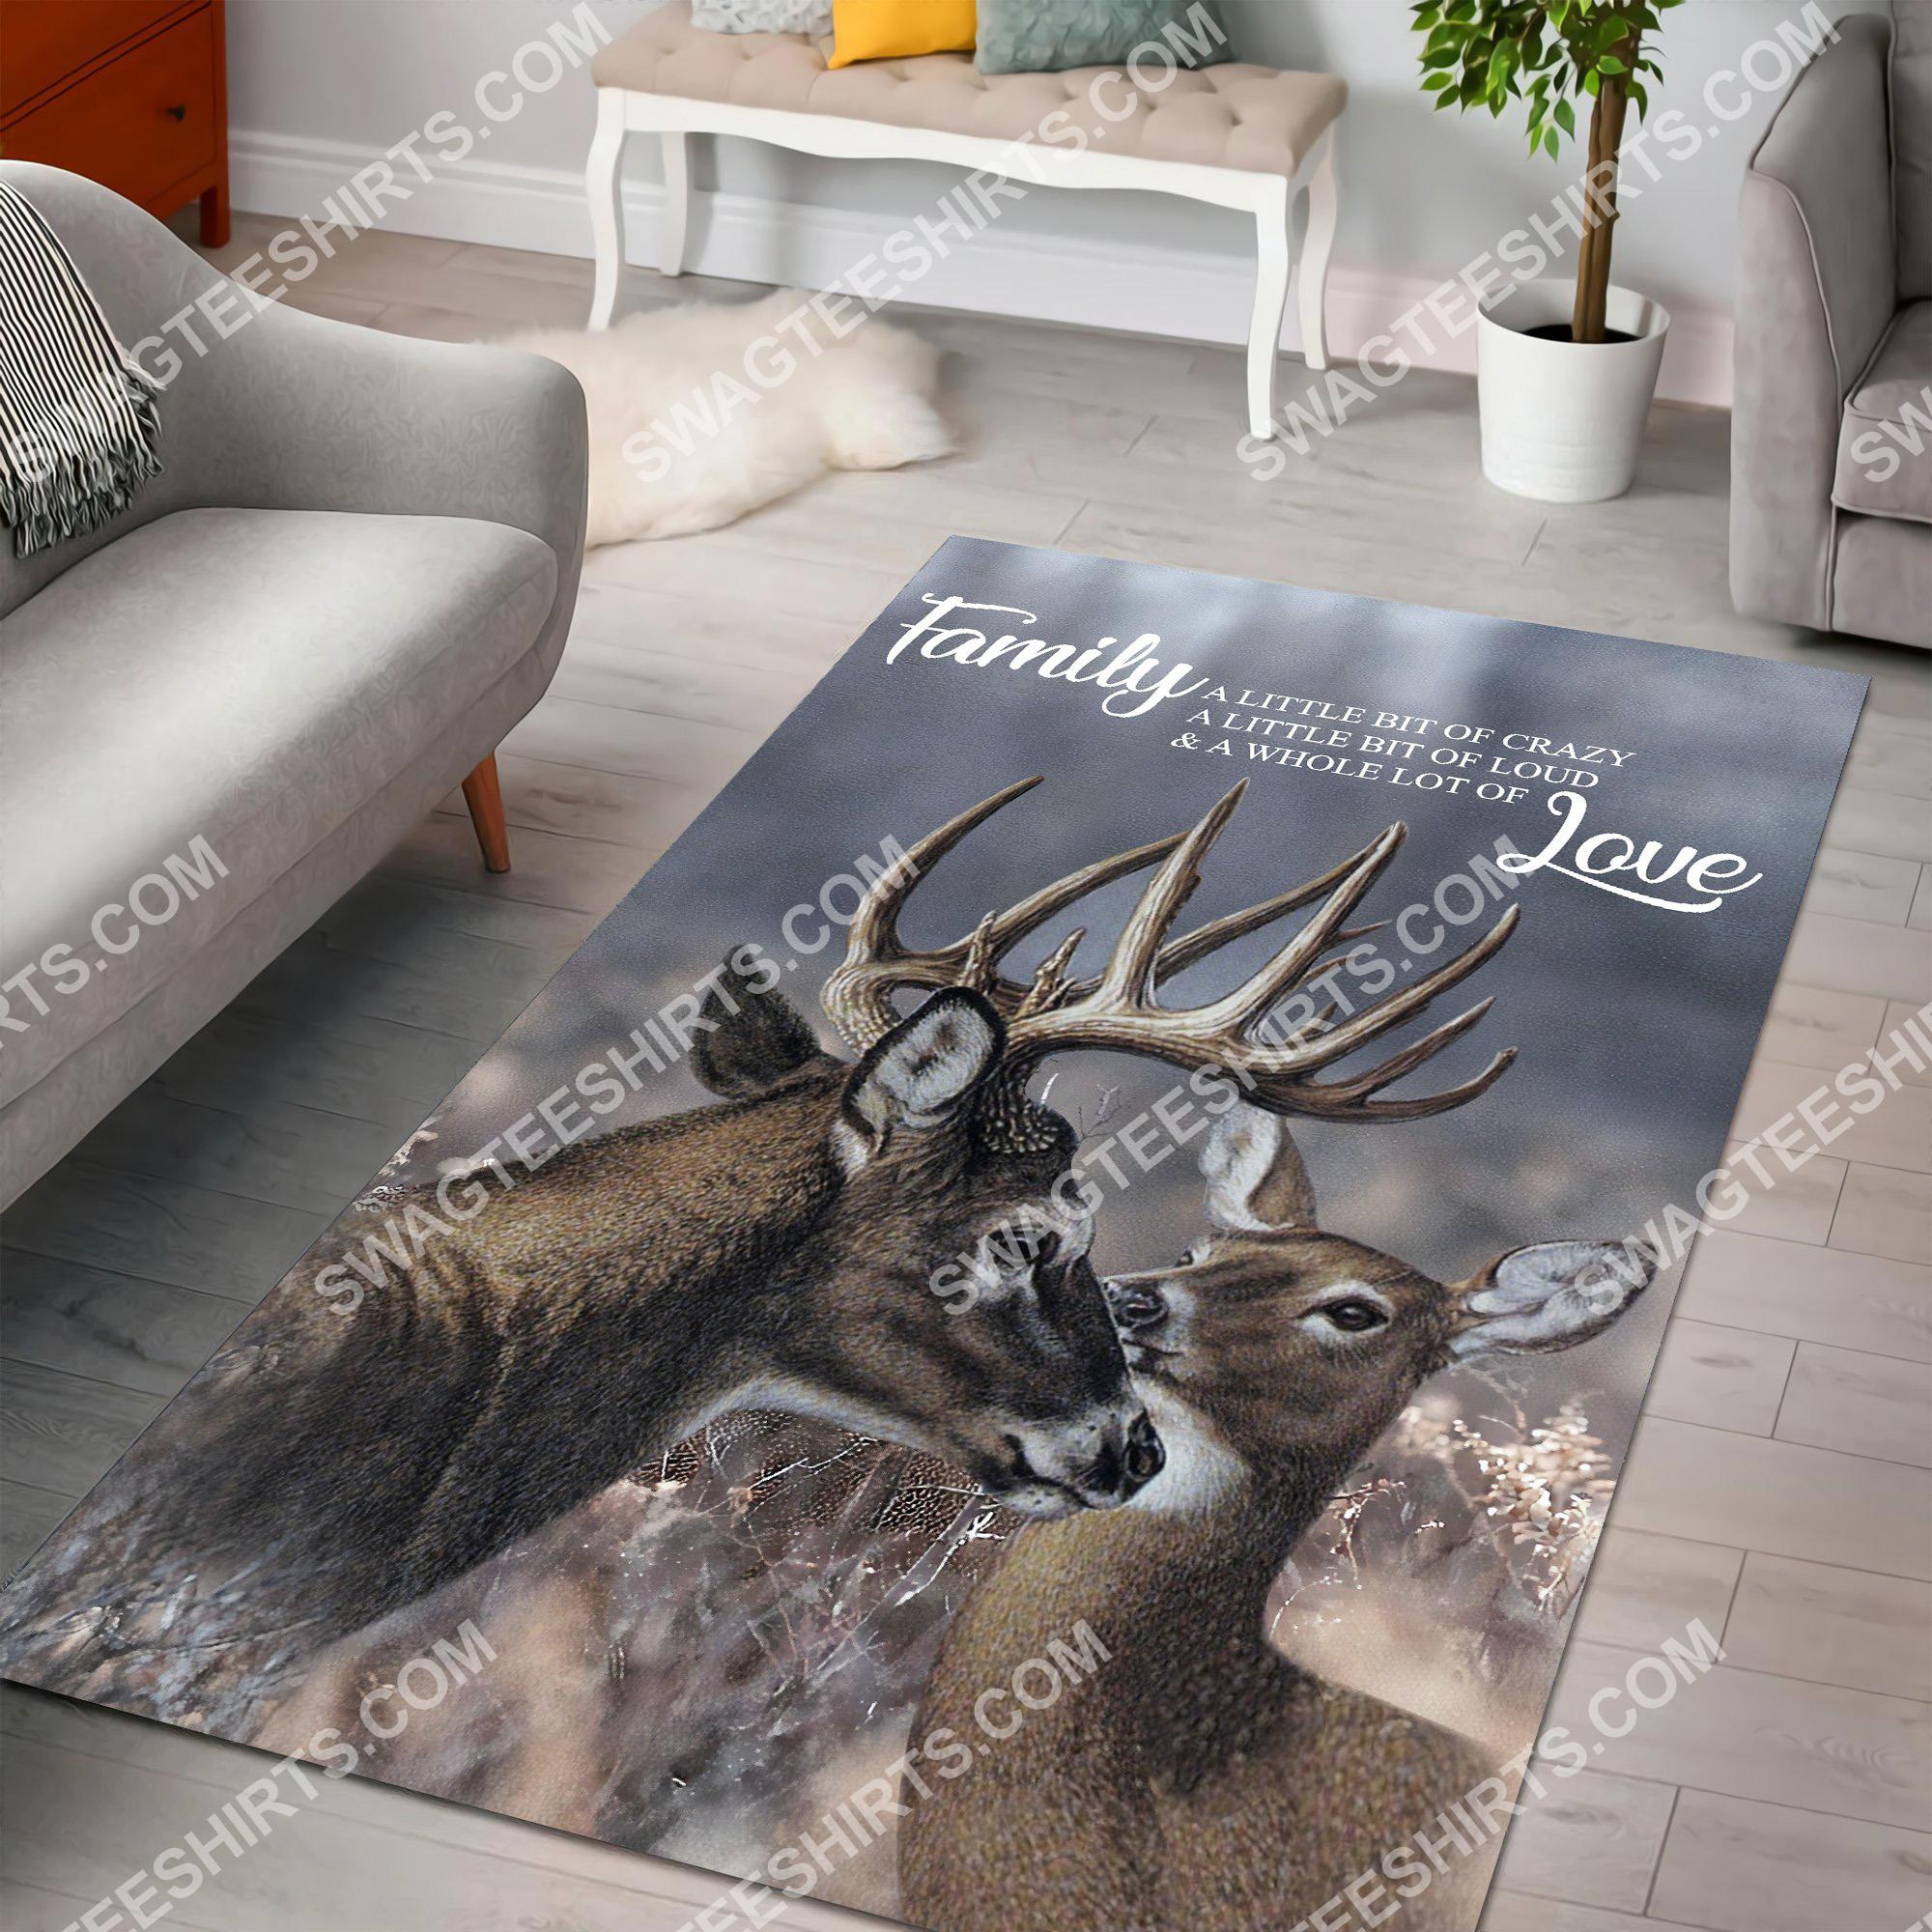 love deer family love all over printed rug 4(1)